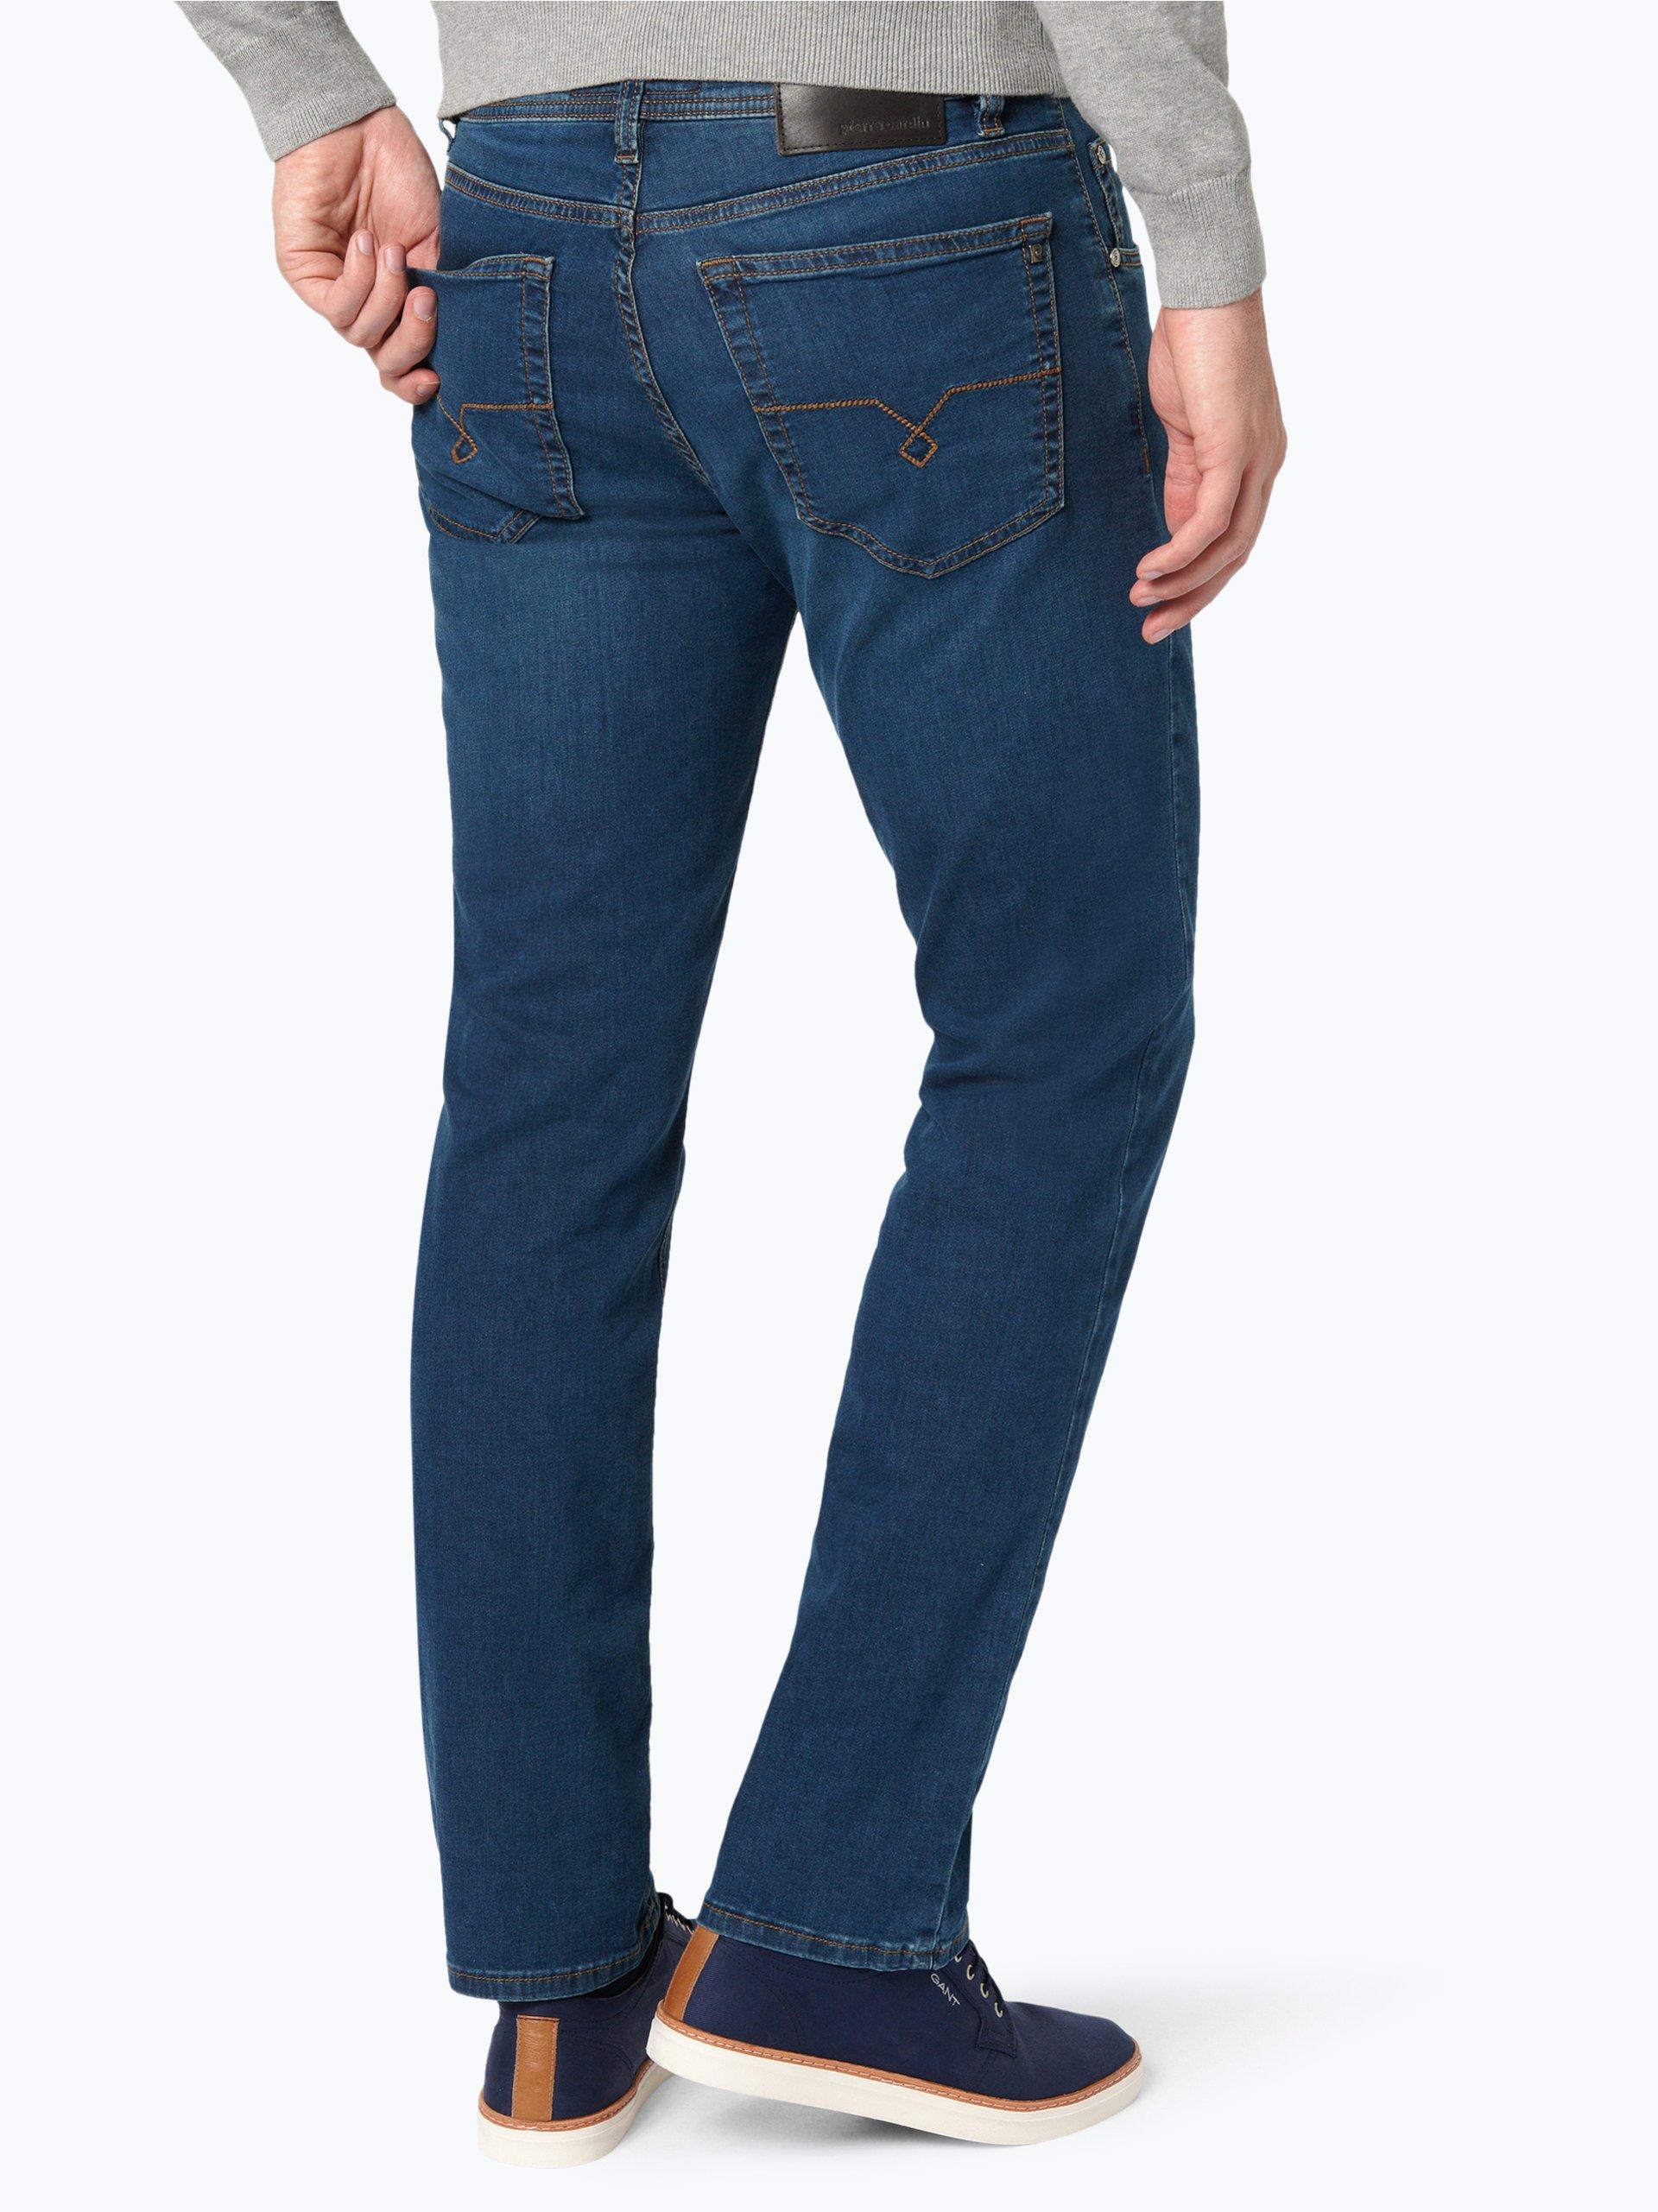 pierre cardin herren jeans deauville dark stone uni. Black Bedroom Furniture Sets. Home Design Ideas